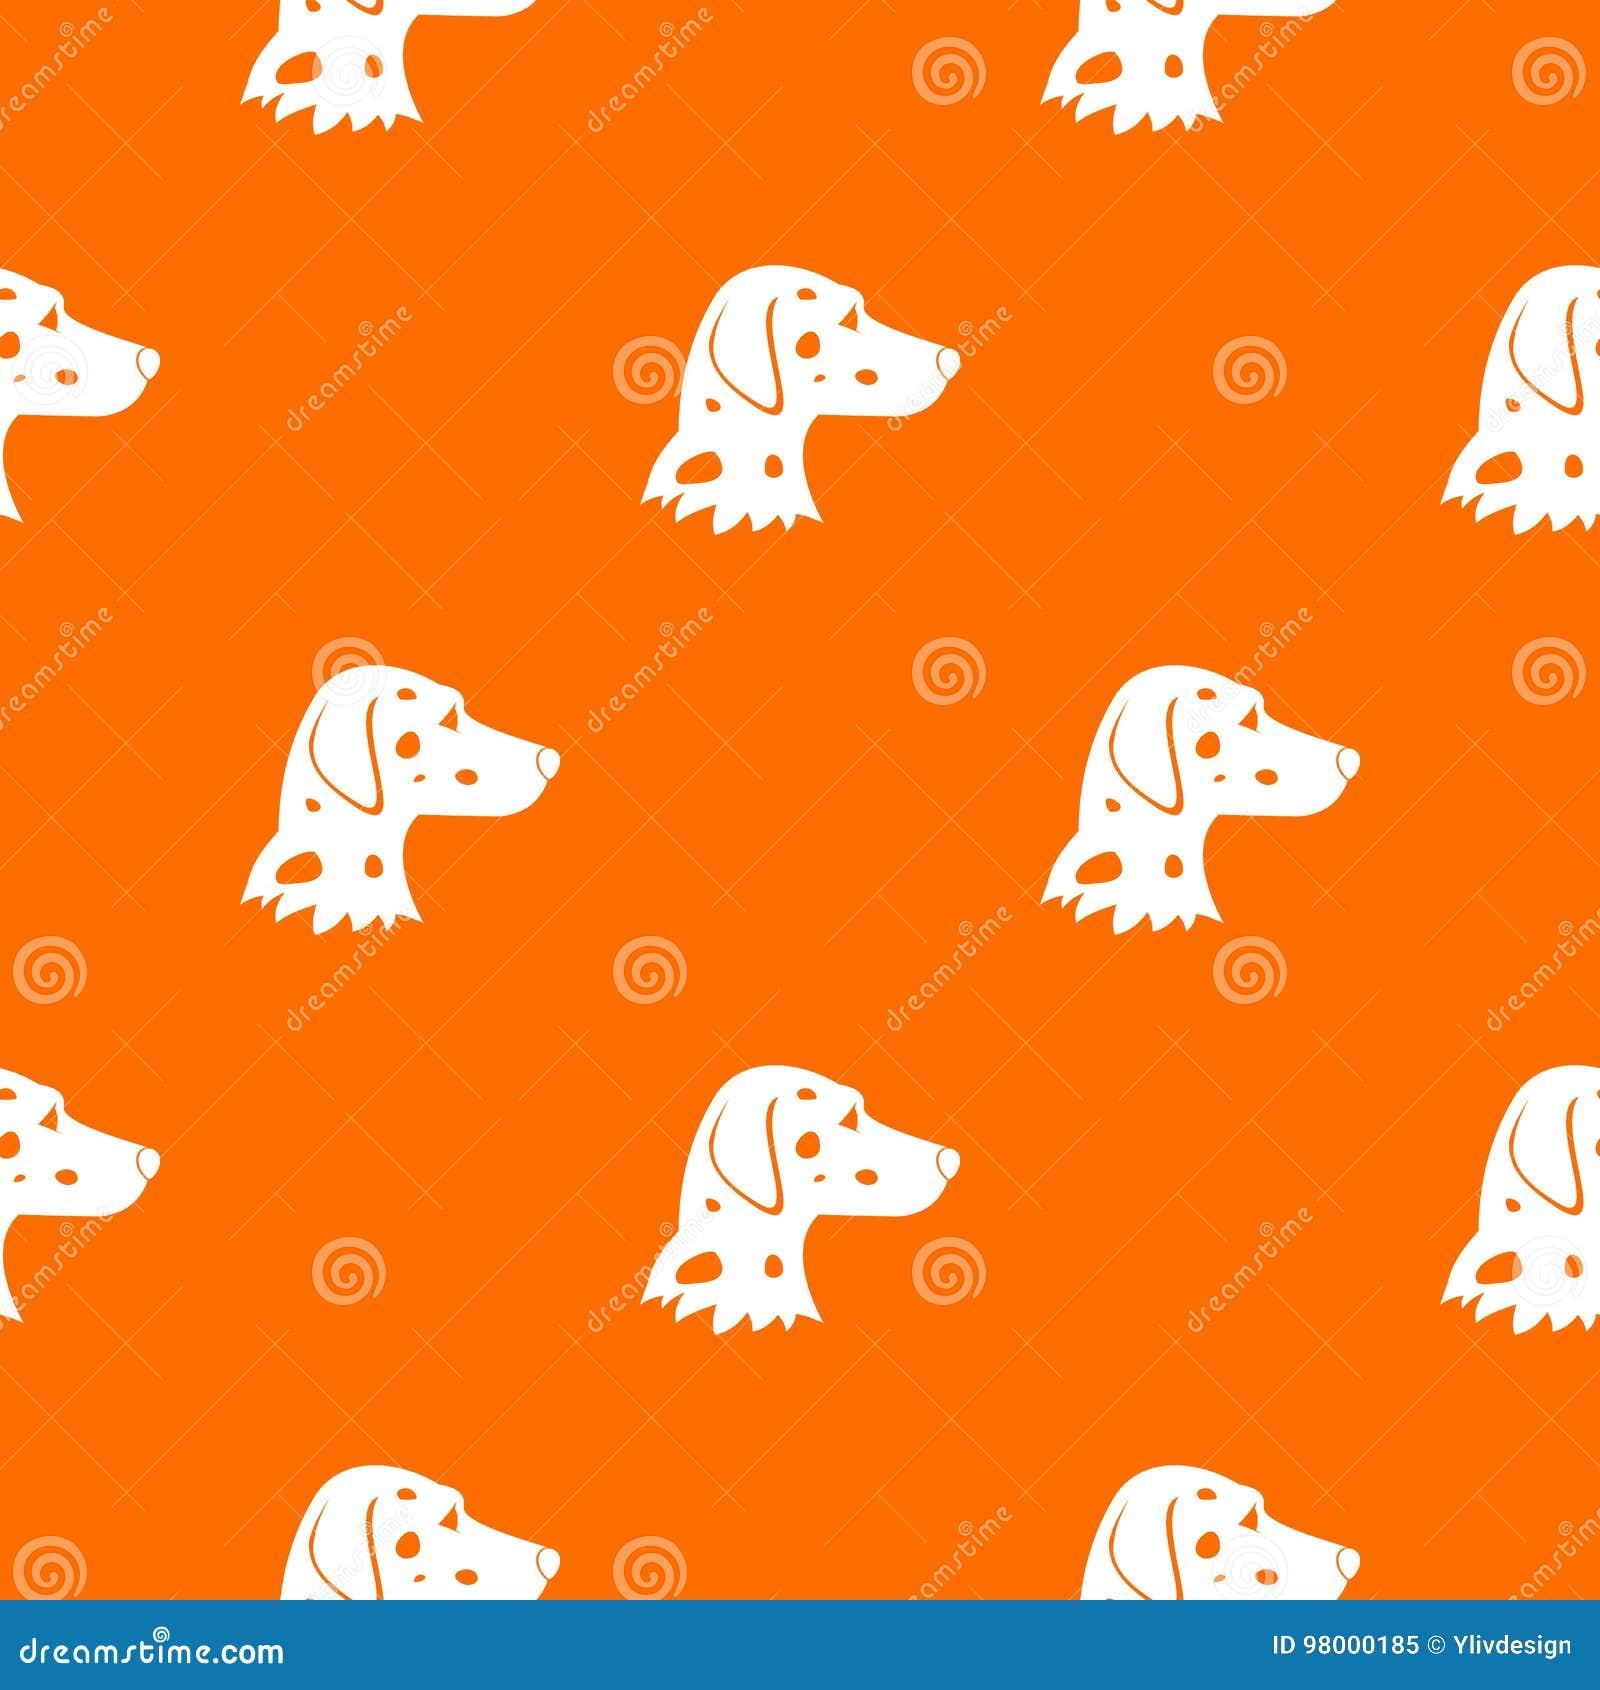 Dalmatians Dog Pattern Seamless Stock Vector Illustration Of Ears